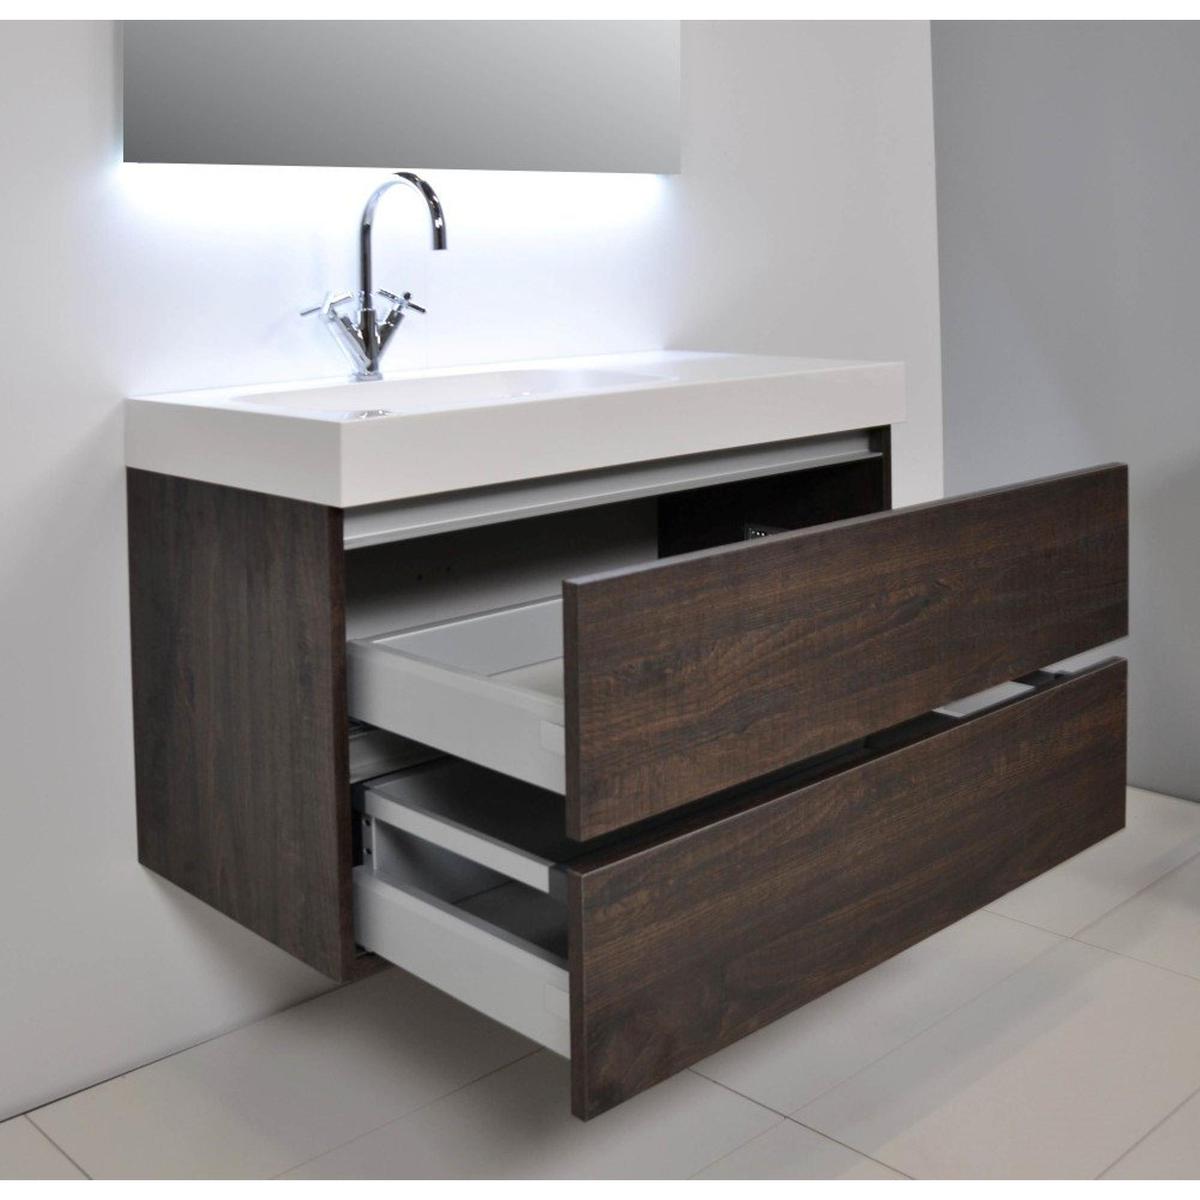 Poignee Meuble Salle De Bain Design Novocom Top